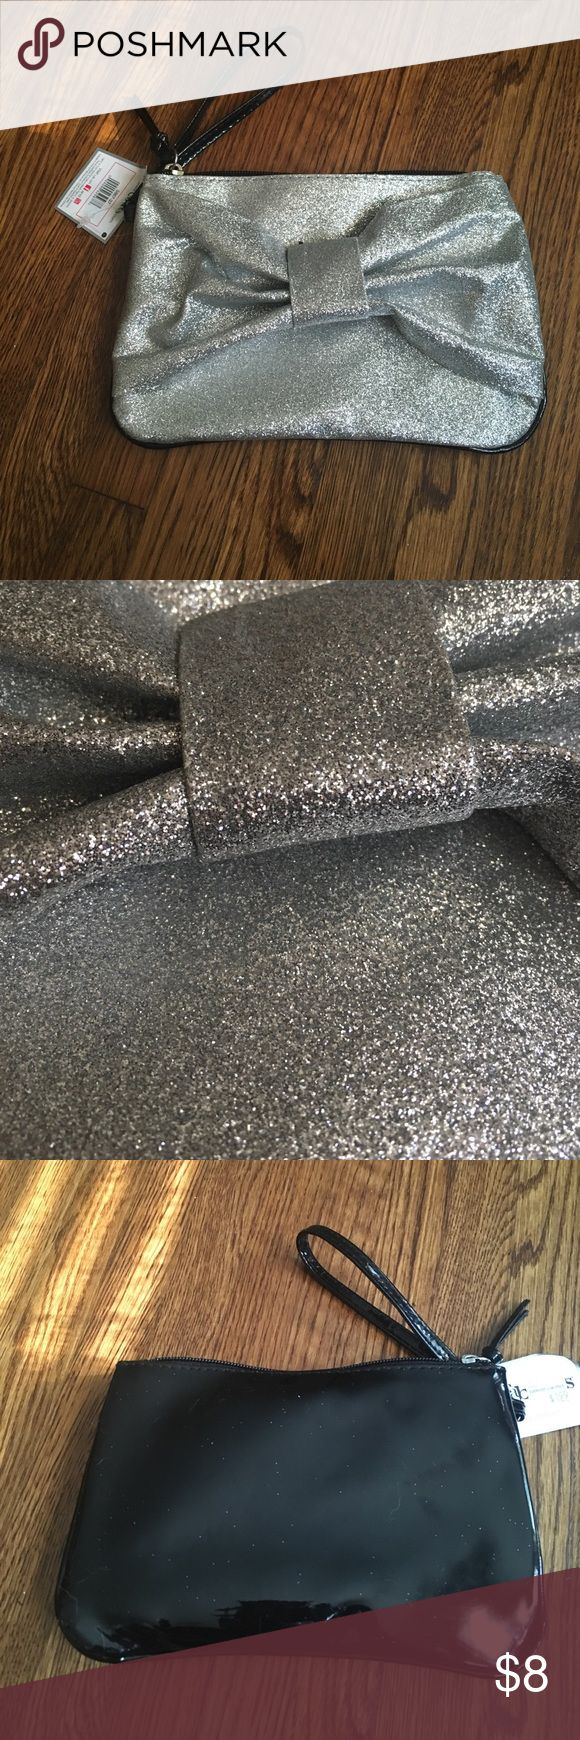 Silver glitter clutch New Clutch bag. Never worn. Very cute. Bags Clutches & Wristlets